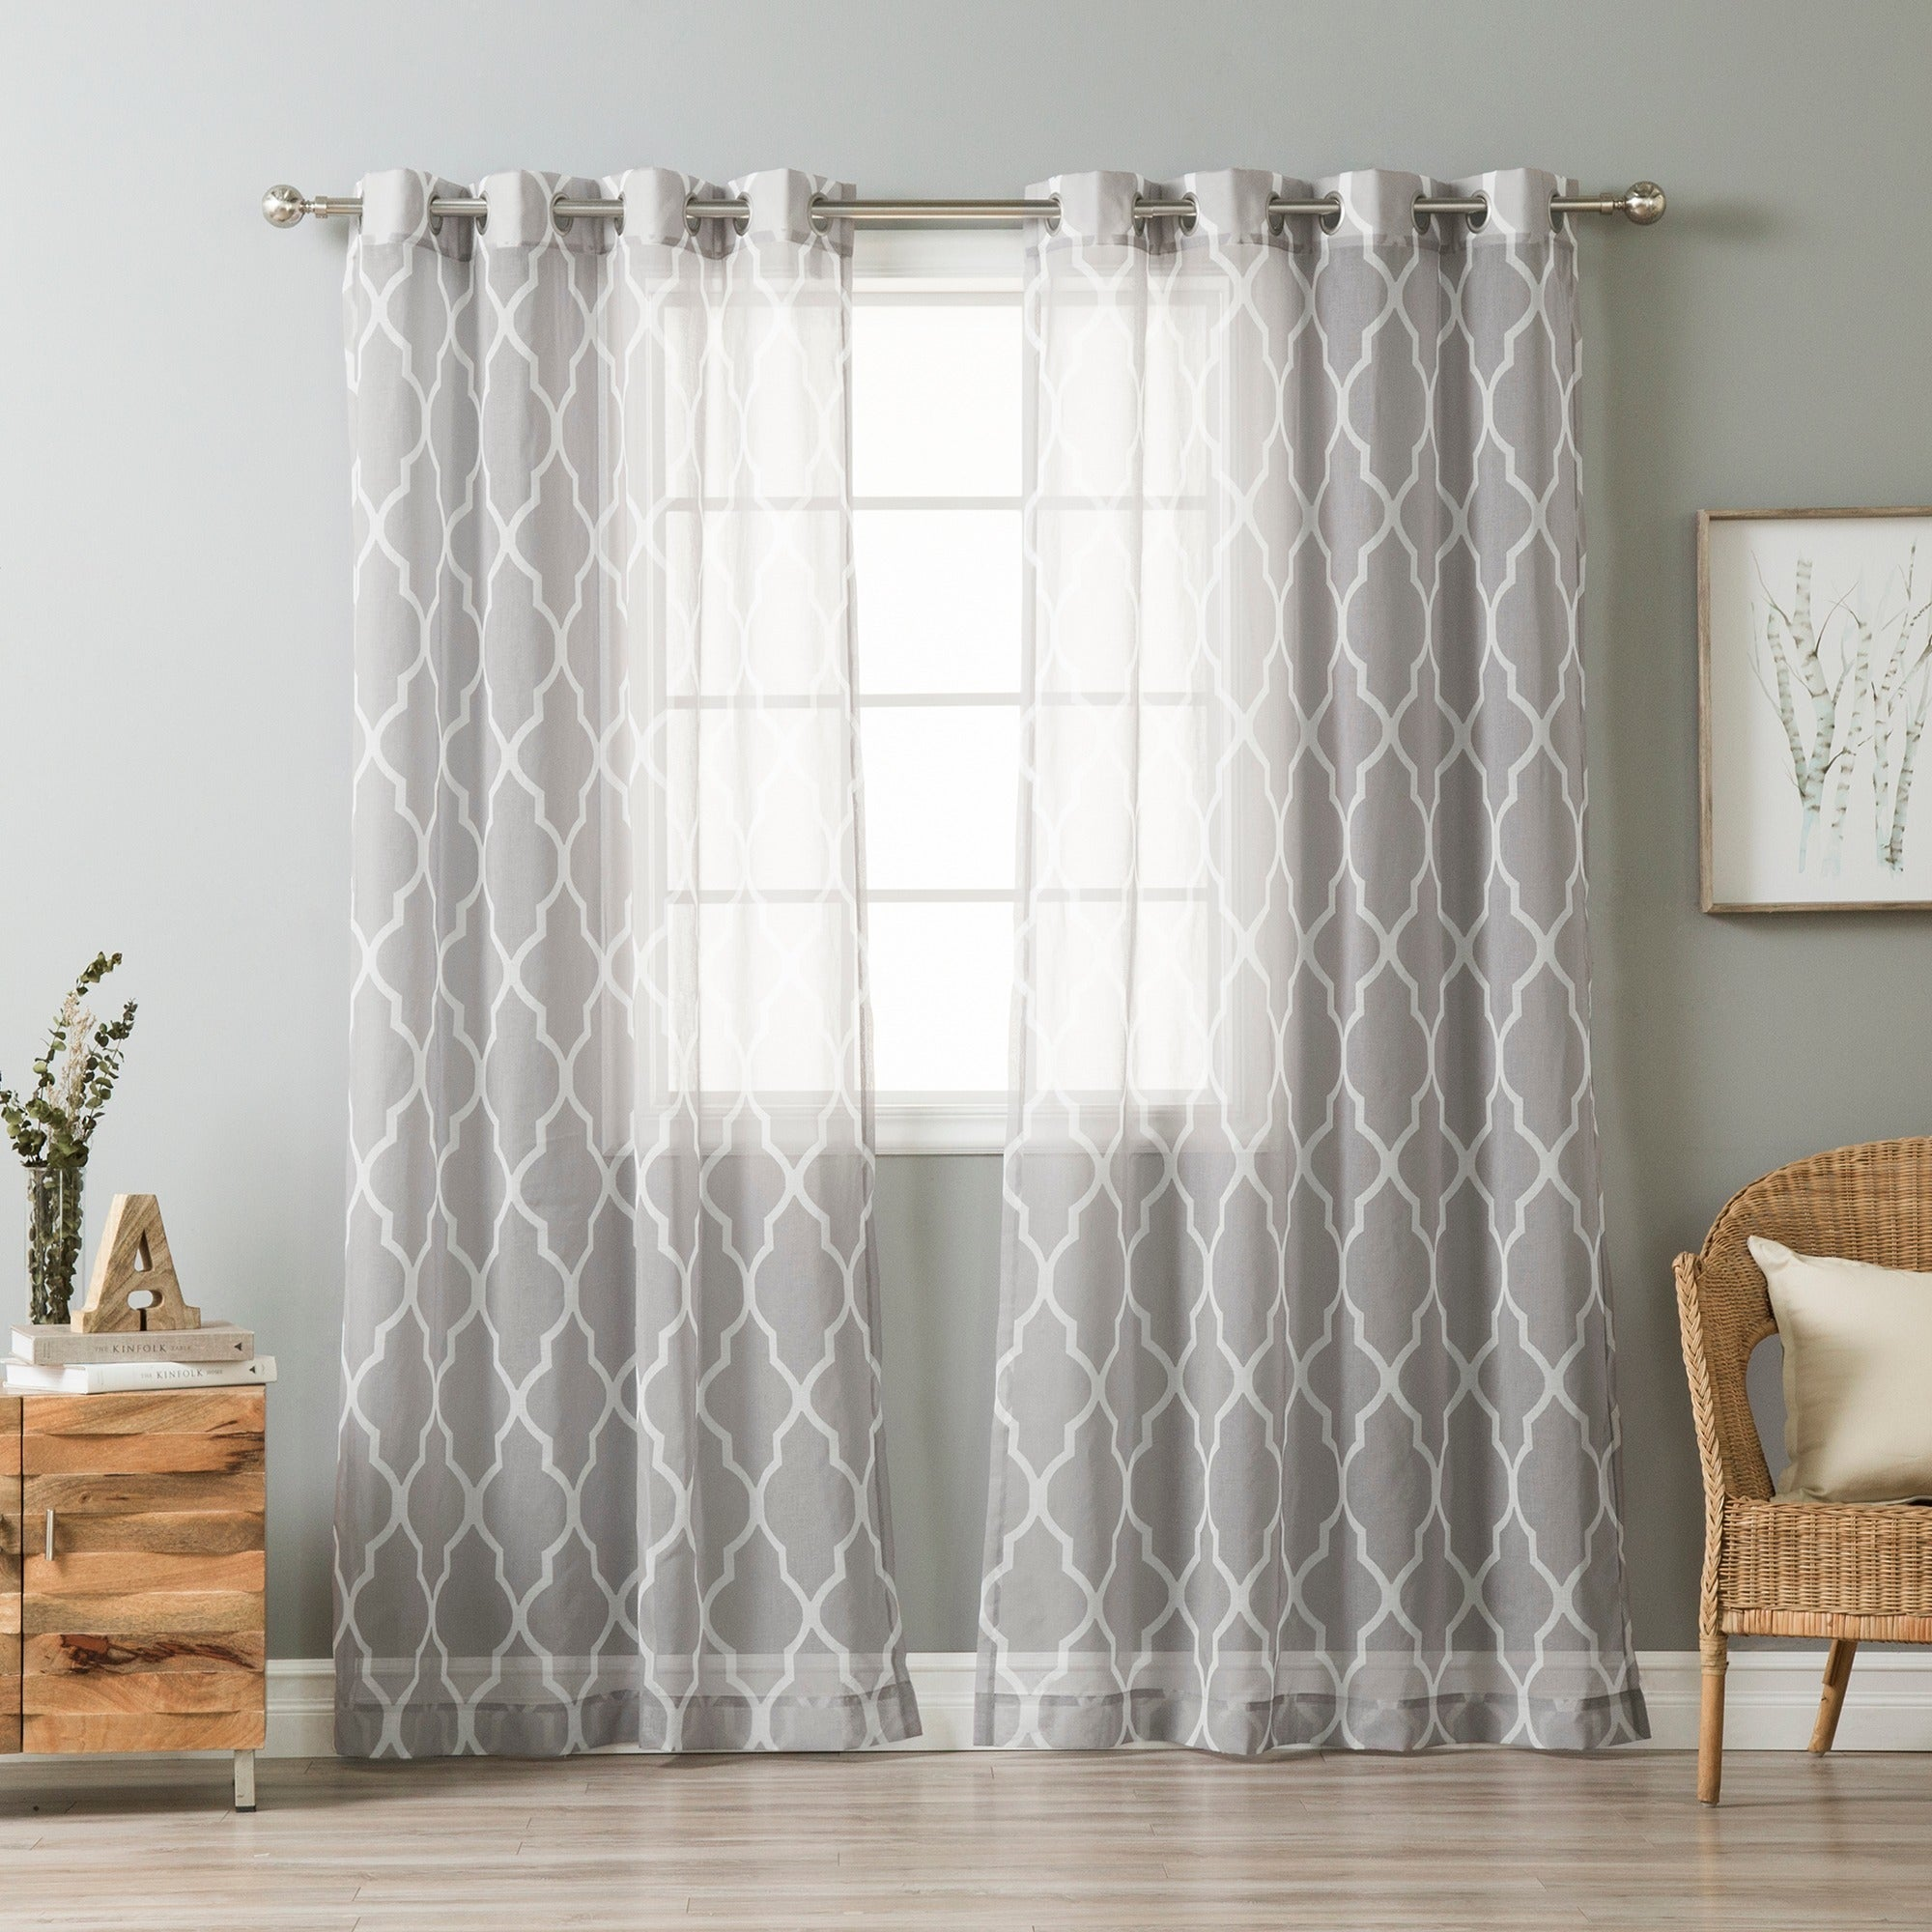 Shop Aurora Home Sheer Moroccan Grommet Top 84 Inch Curtain Panel Pair